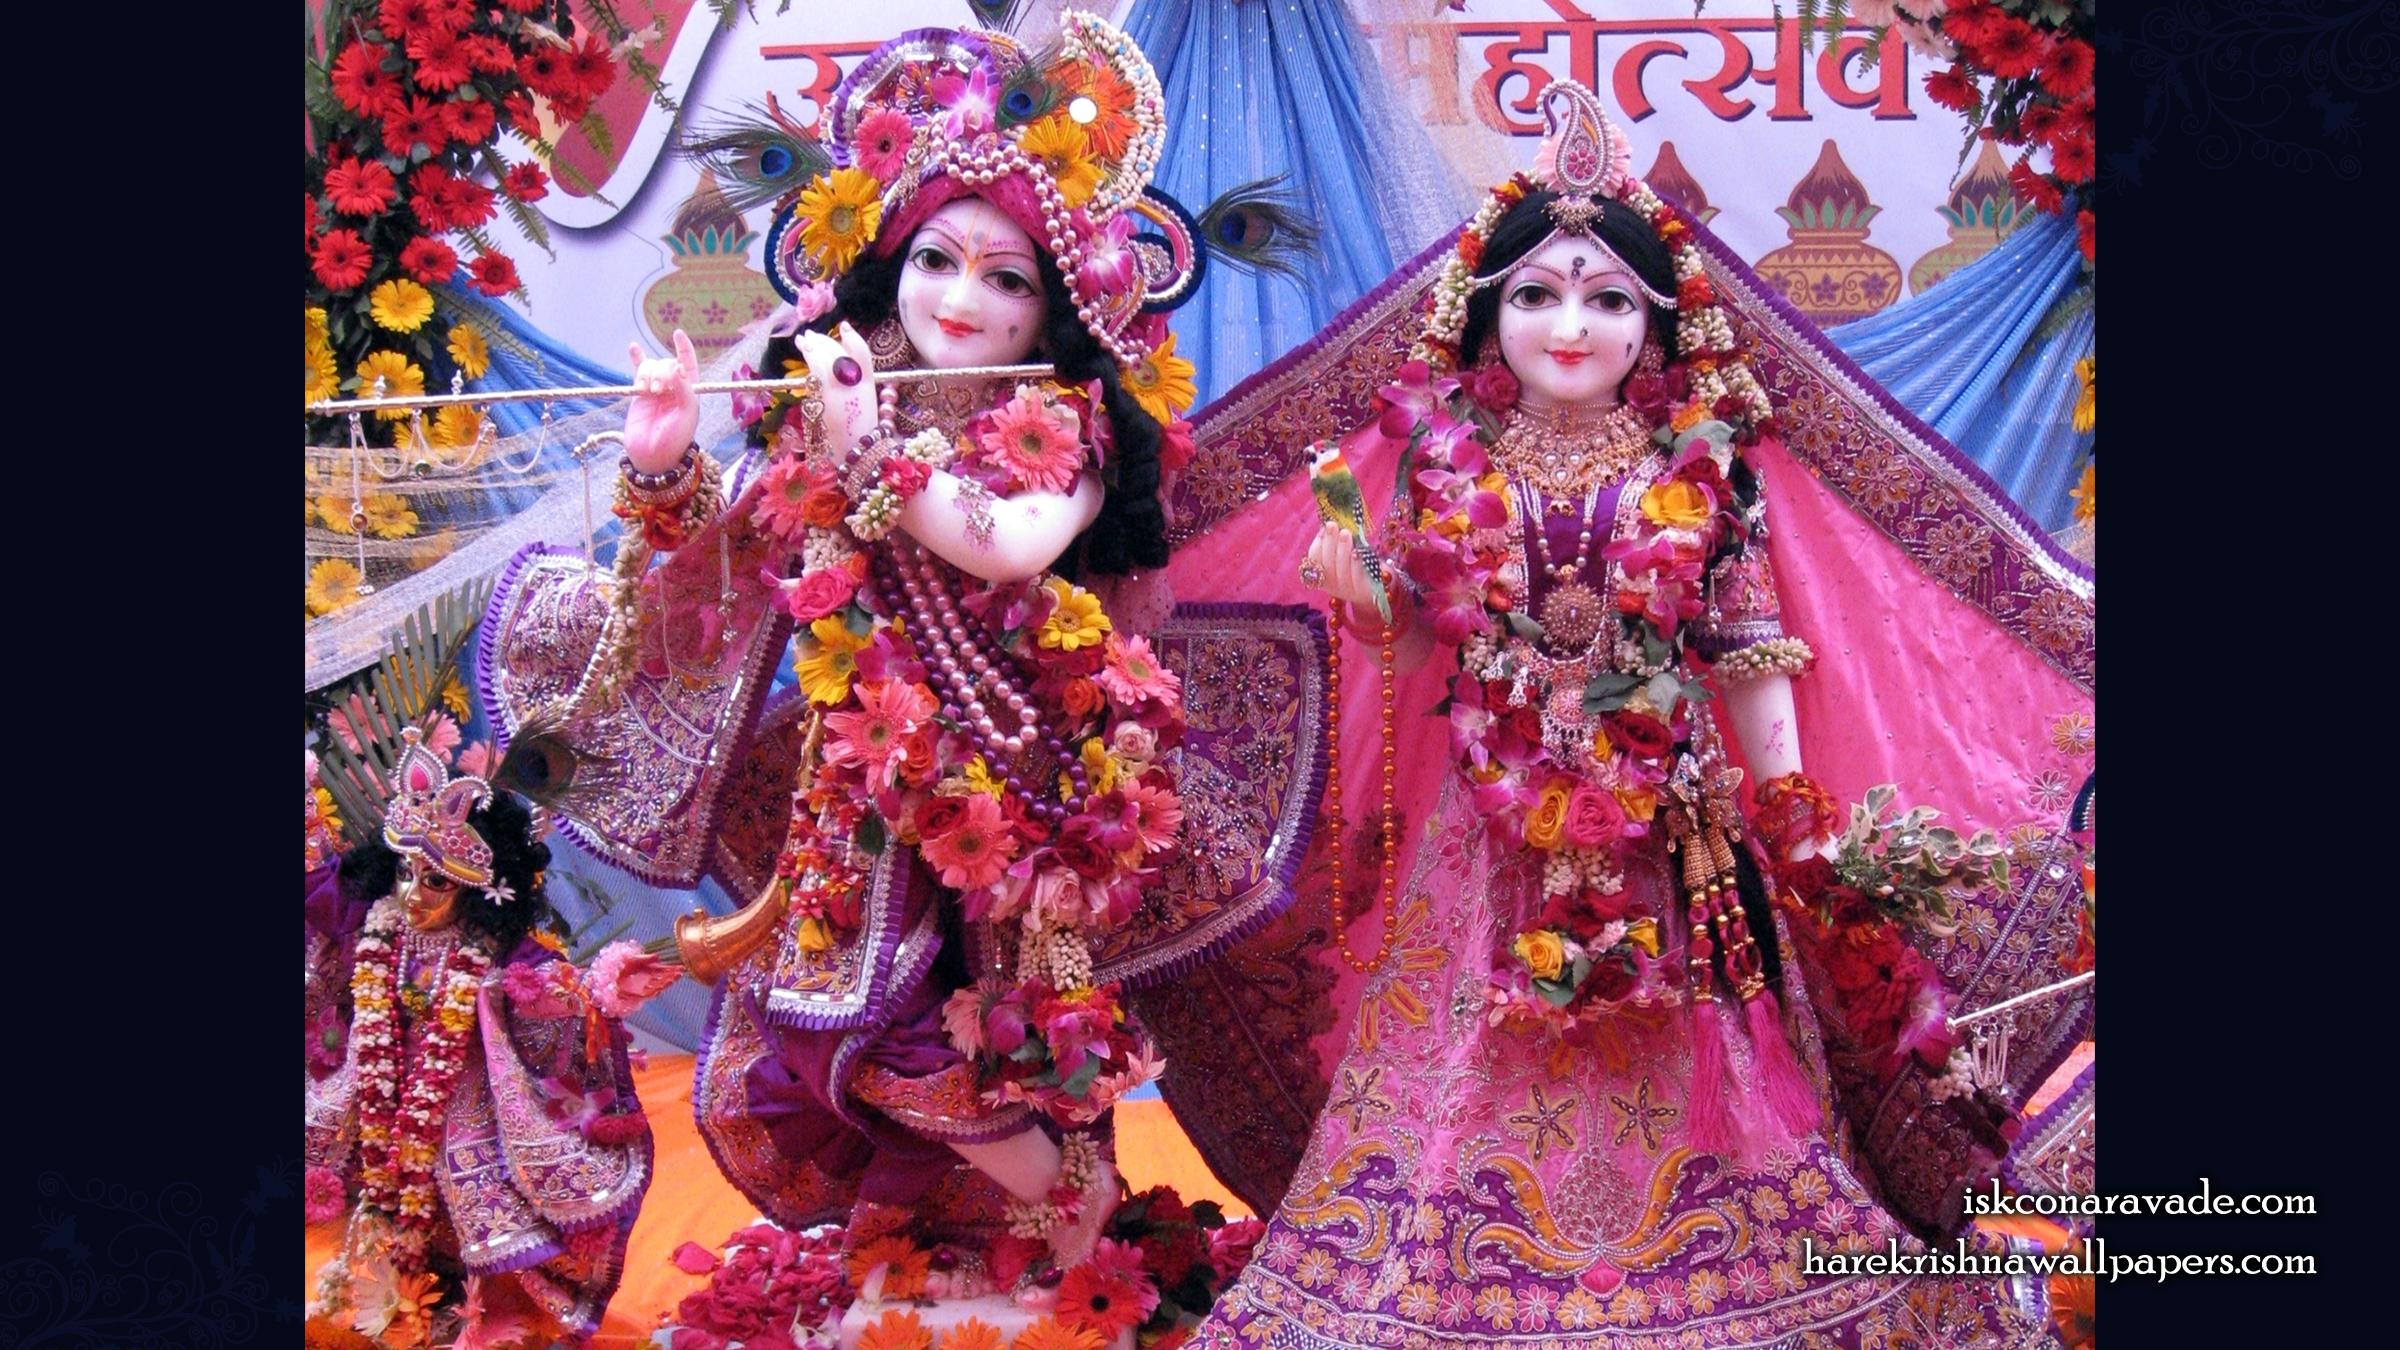 Sri Sri Radha Gopal Wallpaper (001) Size 2400x1350 Download